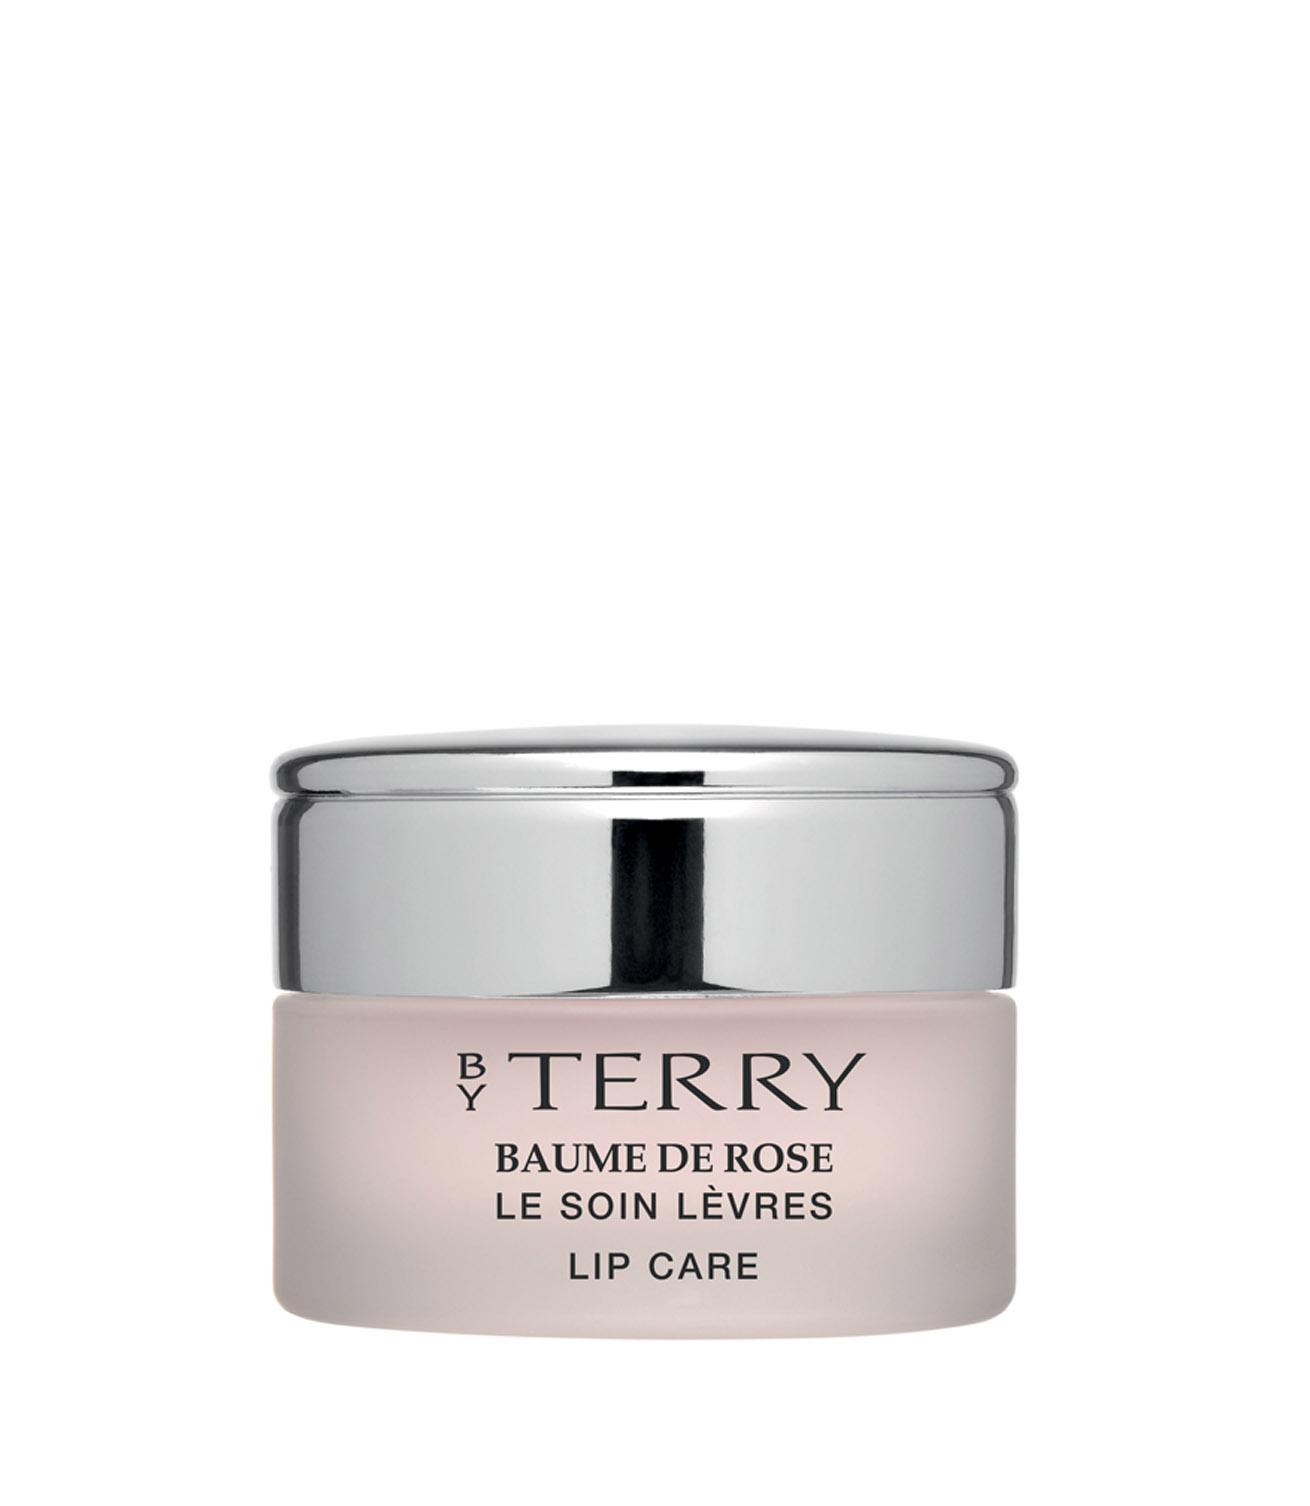 1-Baume-de-Rose-Lip-Care-SPF-15-vasetto-balsamo-labbra-ultra-ammorbidente-Linea-makeup-di-lusso-By-Terry-Dispar-SpA.jpg